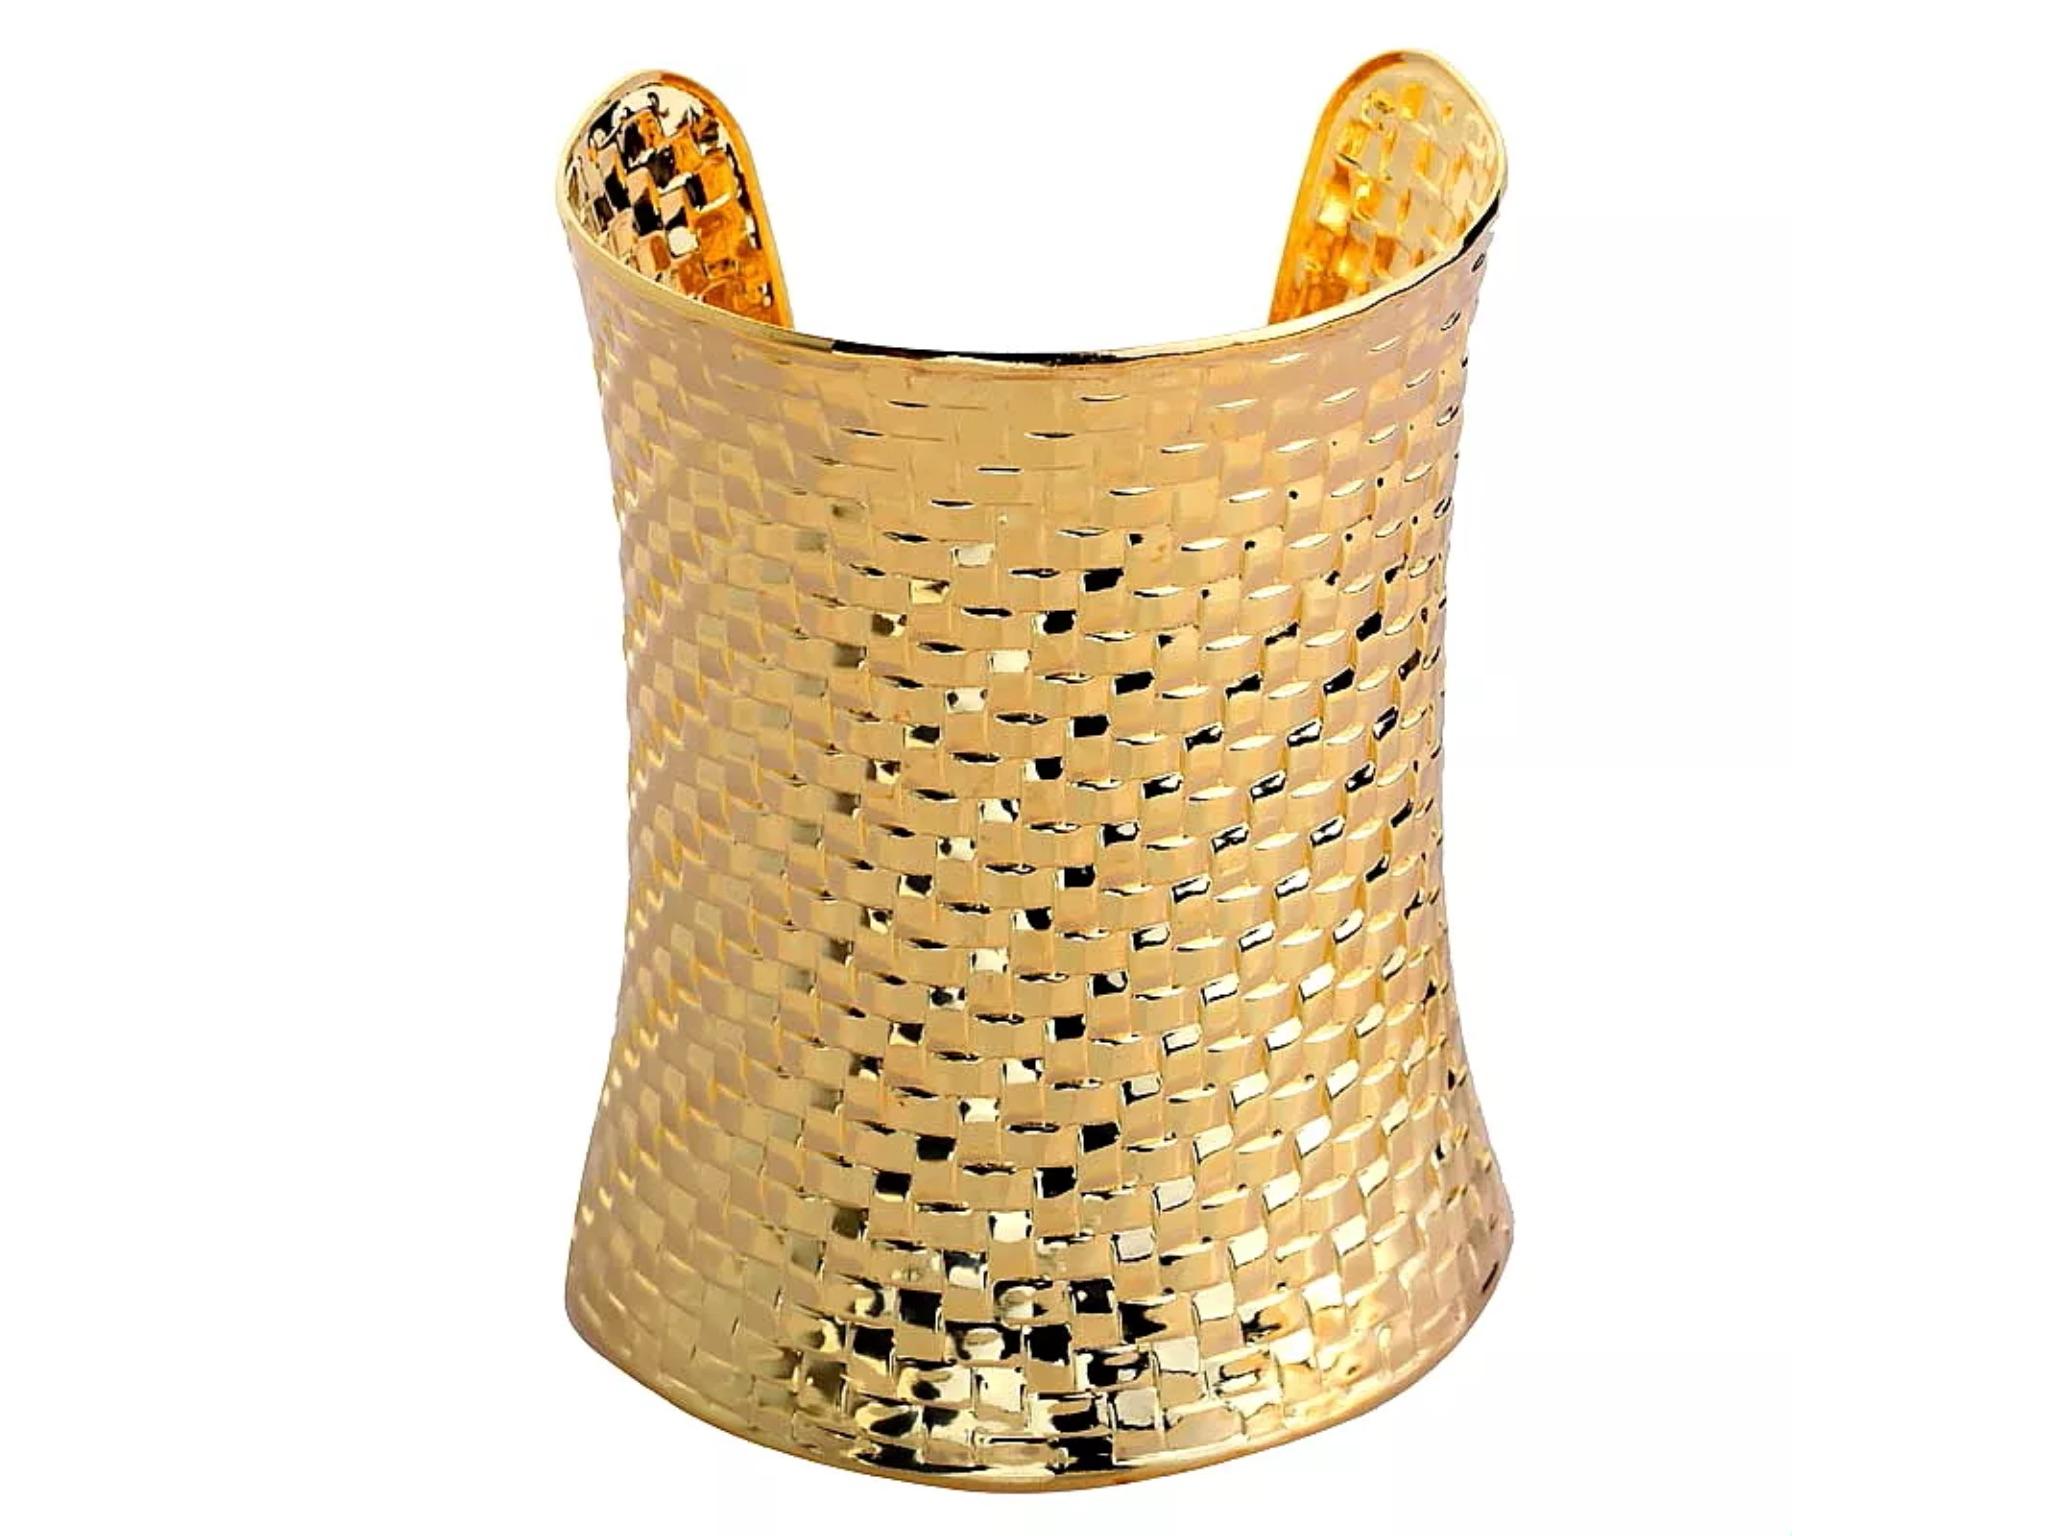 The Gigi Cuff Bracelet